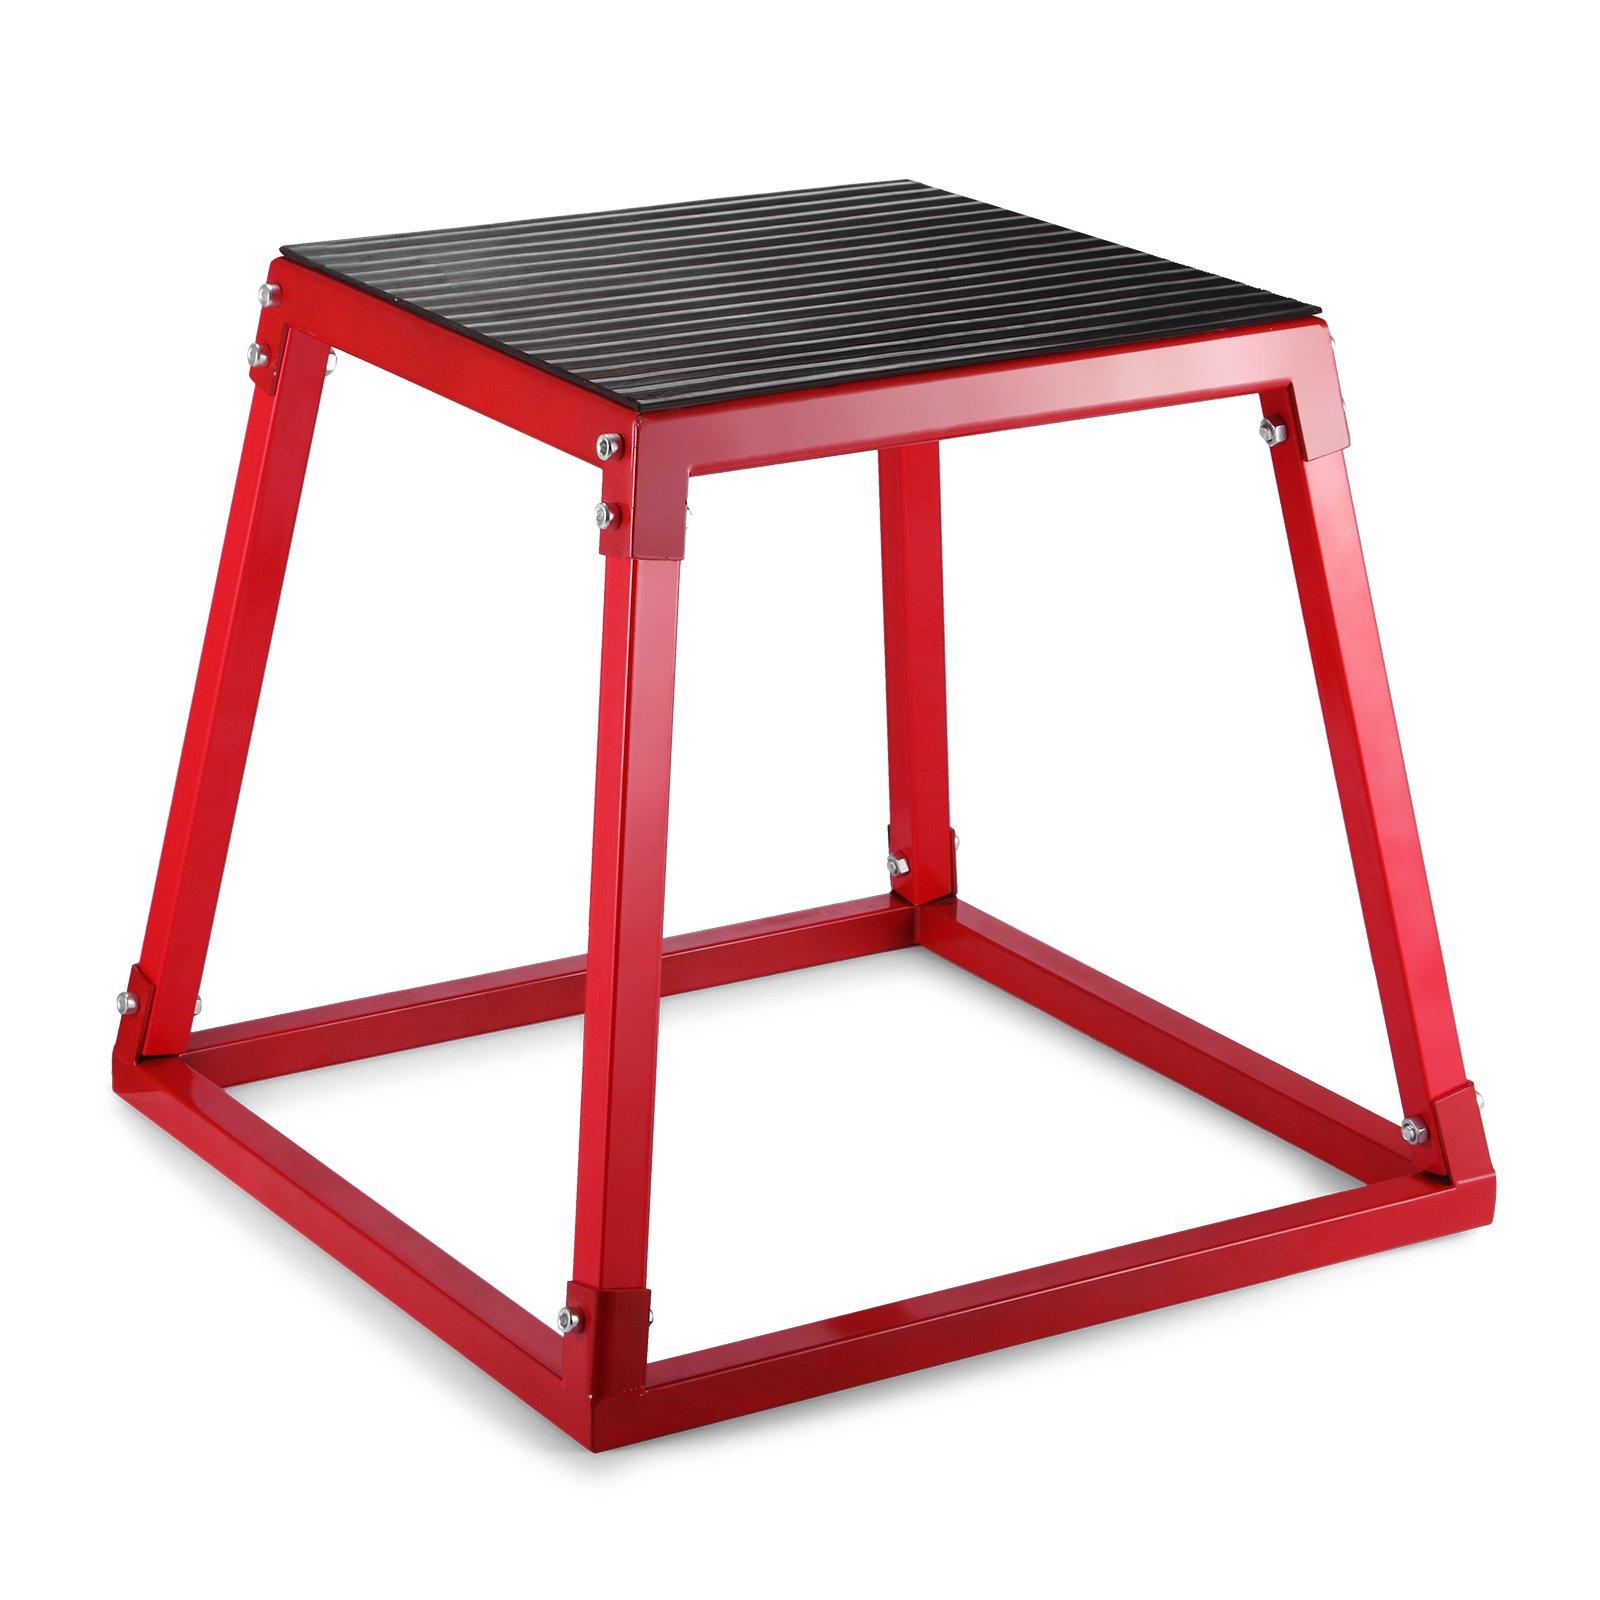 OrangeA Plyometric Boxes 12 Inch 18 Inch 24 Inch Plyometric Platform Jump Box Exercise Plyometric Jump Boxes for Jump Training (12 Inch)